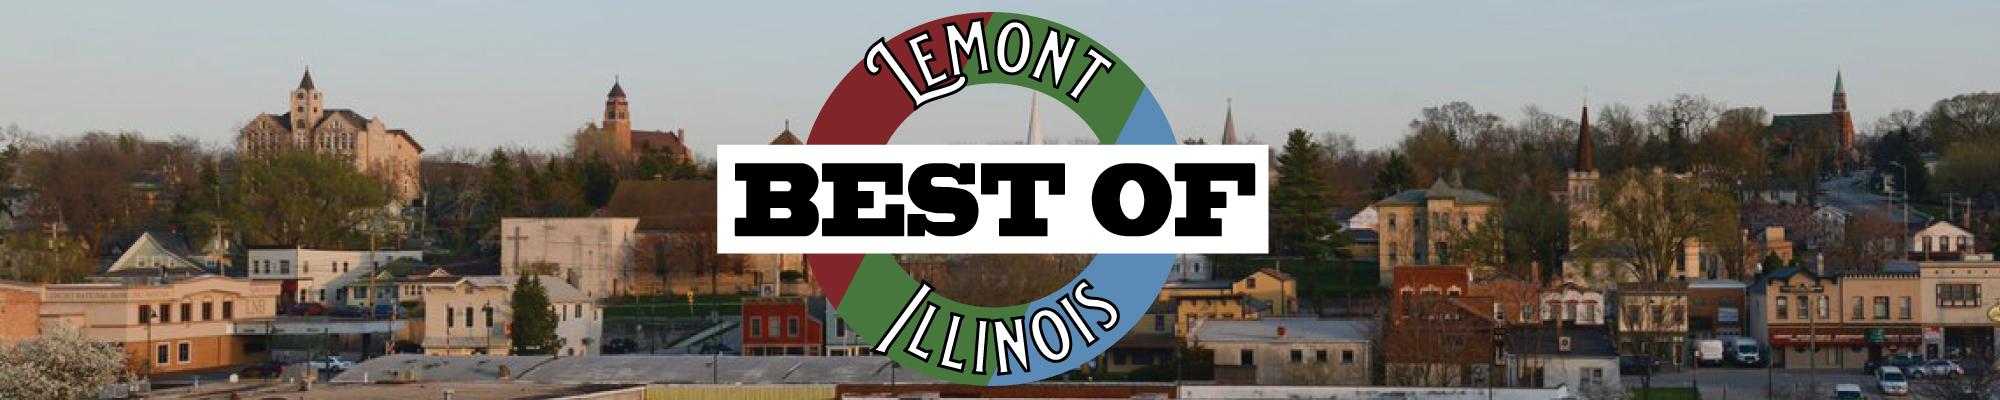 Skyline of Lemont, with Best of Lemont logo on front